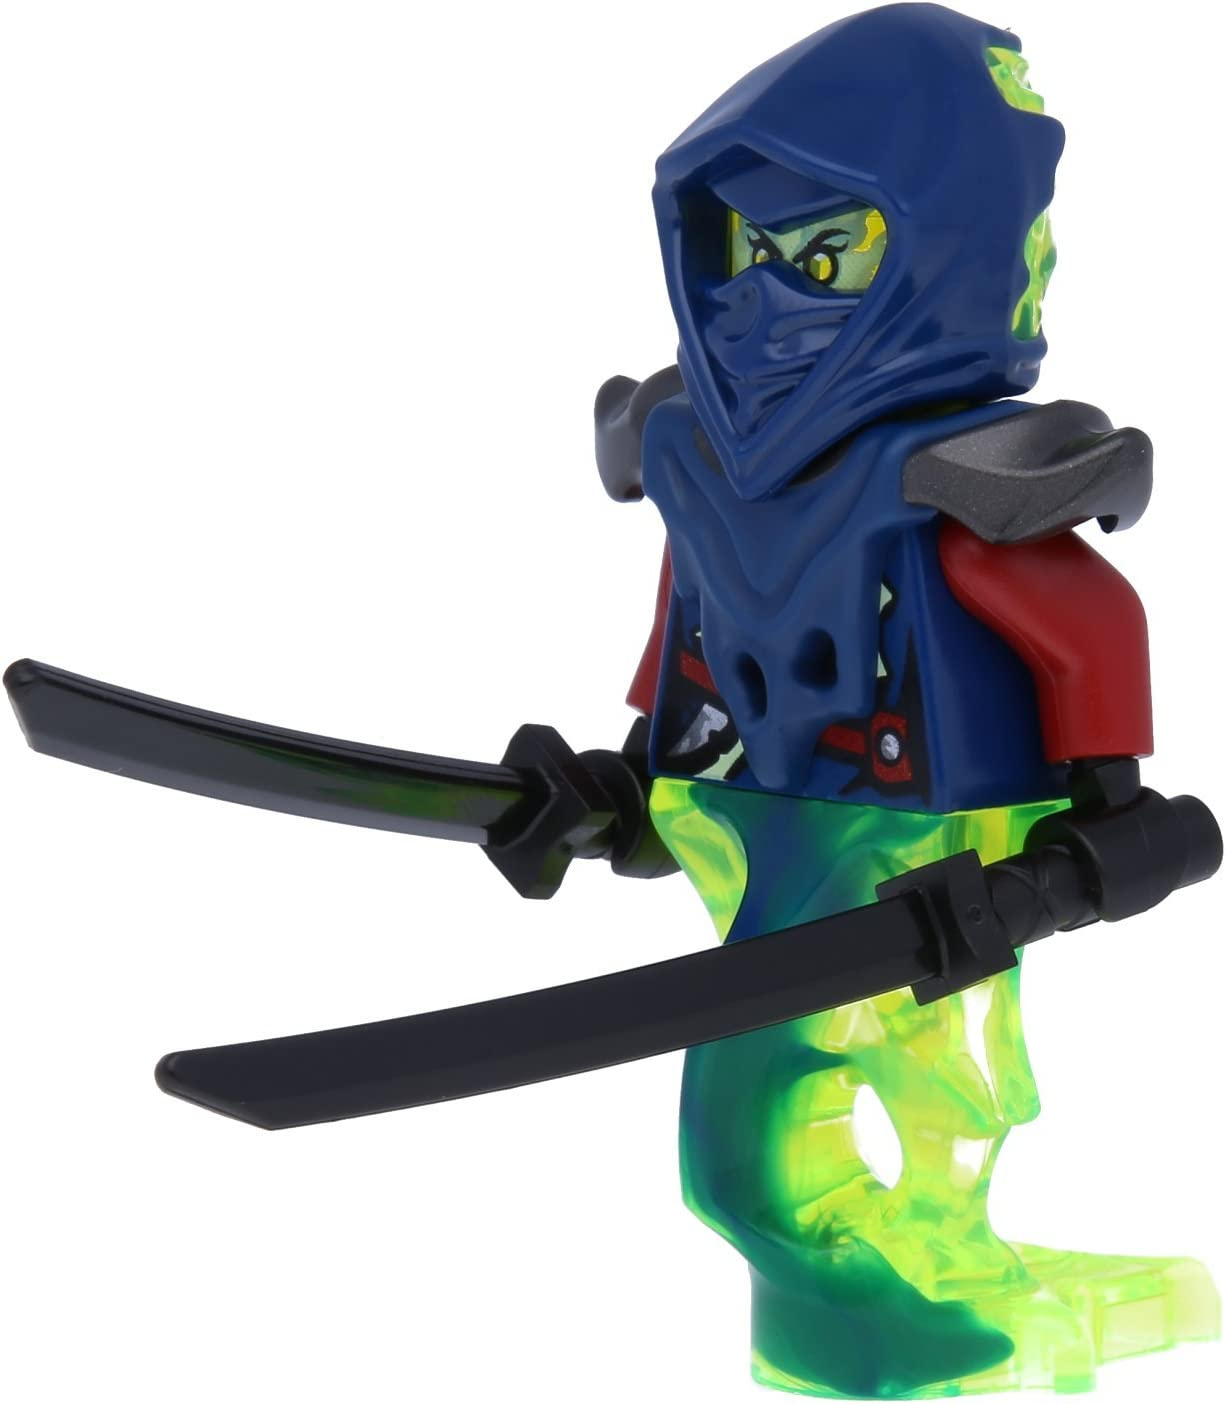 LEGO Ninjago Minifugur Blade Master Bansha - Ghost Legs NEU aus Set 70738 INKL. Zwei seltenen Ninja Schwertern